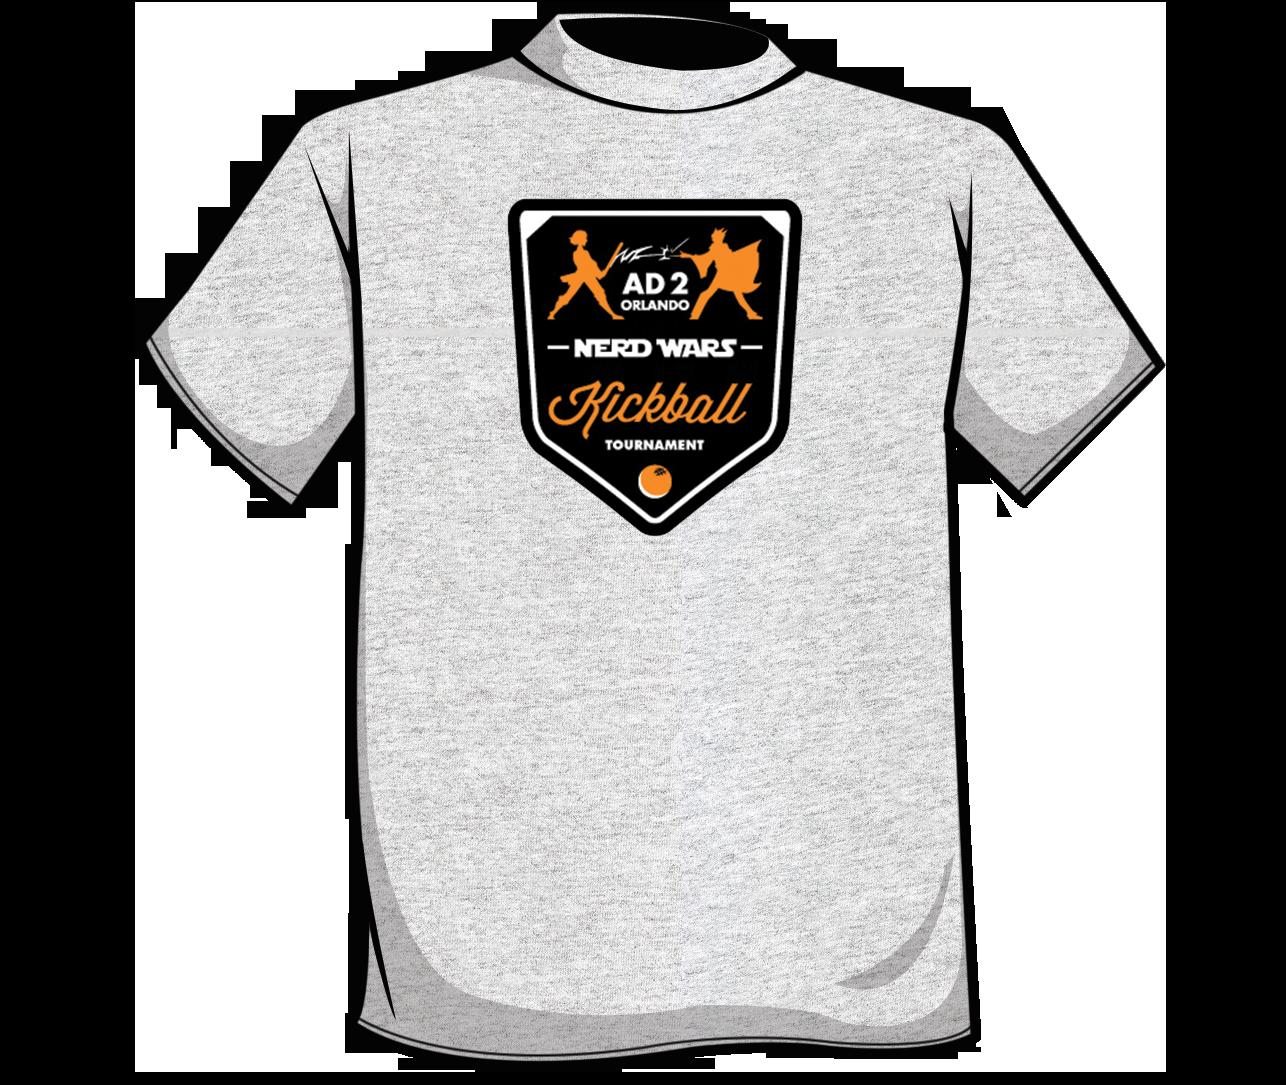 kickball-shirt-mockup